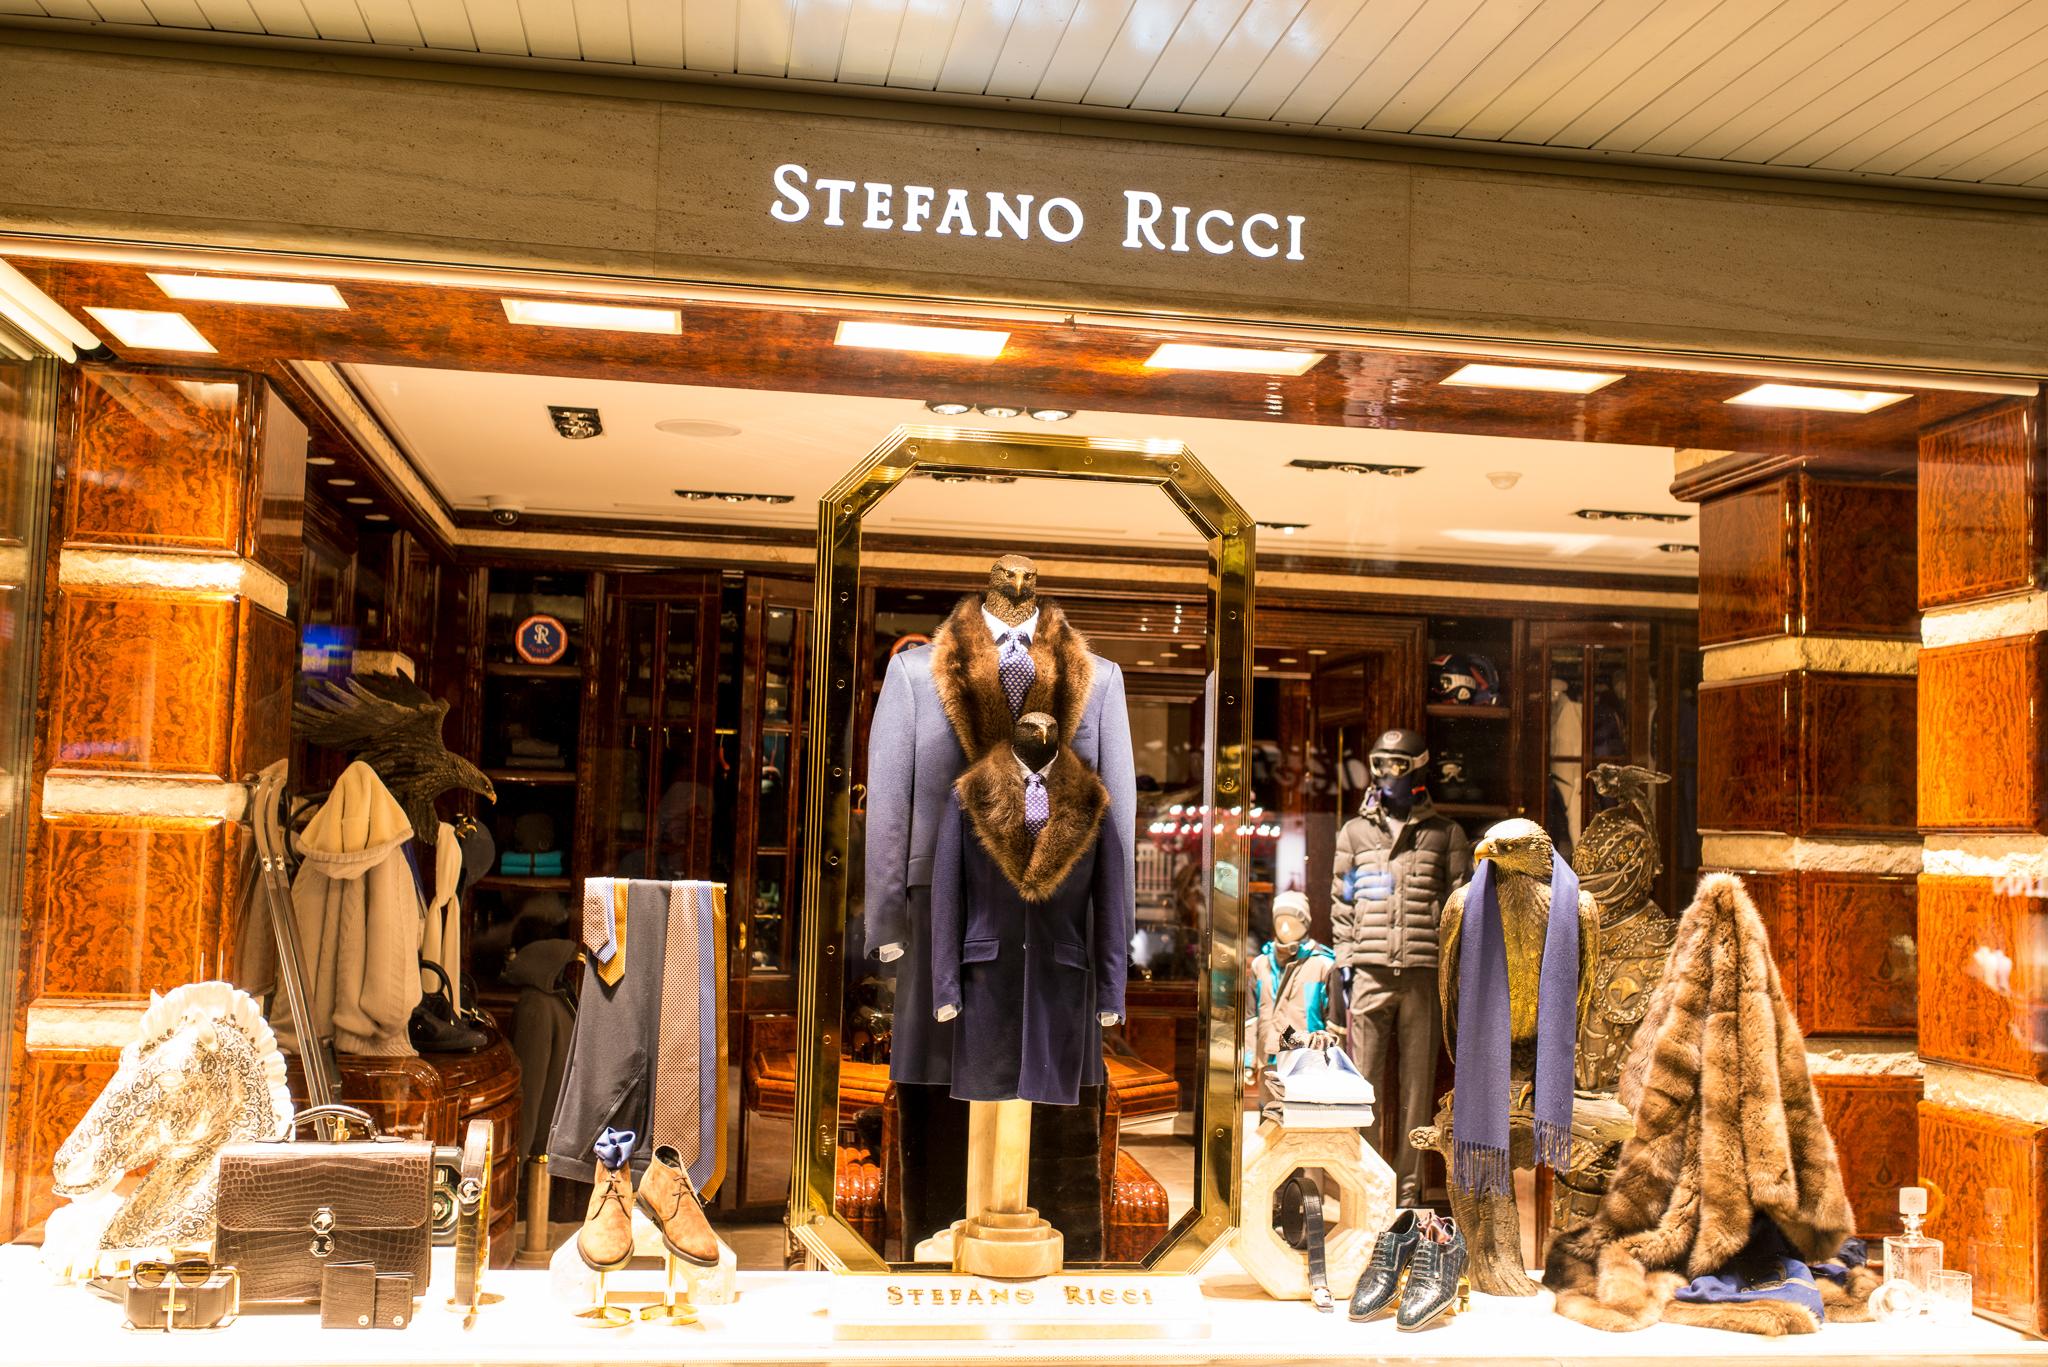 Stefano Ricci - St. Moritz